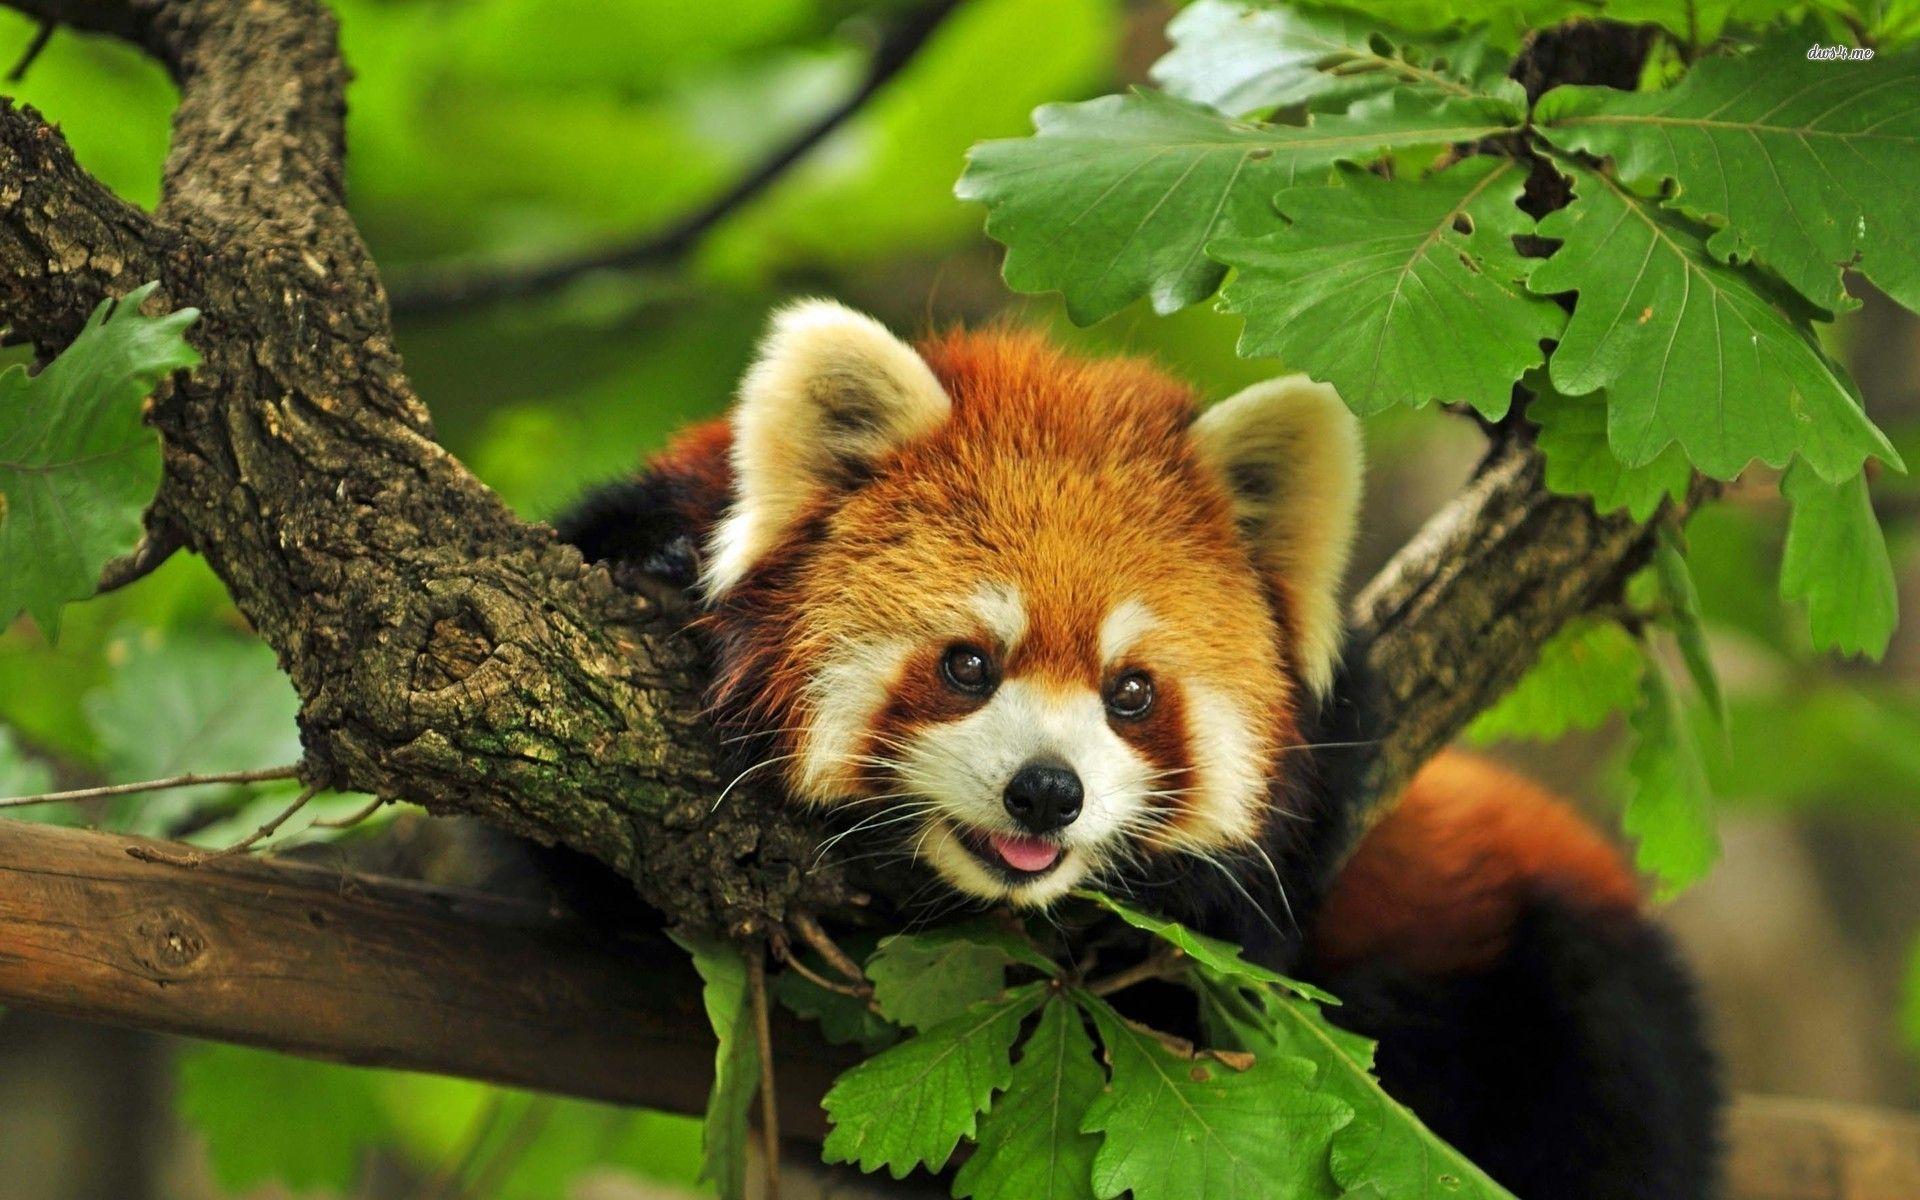 Red panda, they're sooo cute! >w